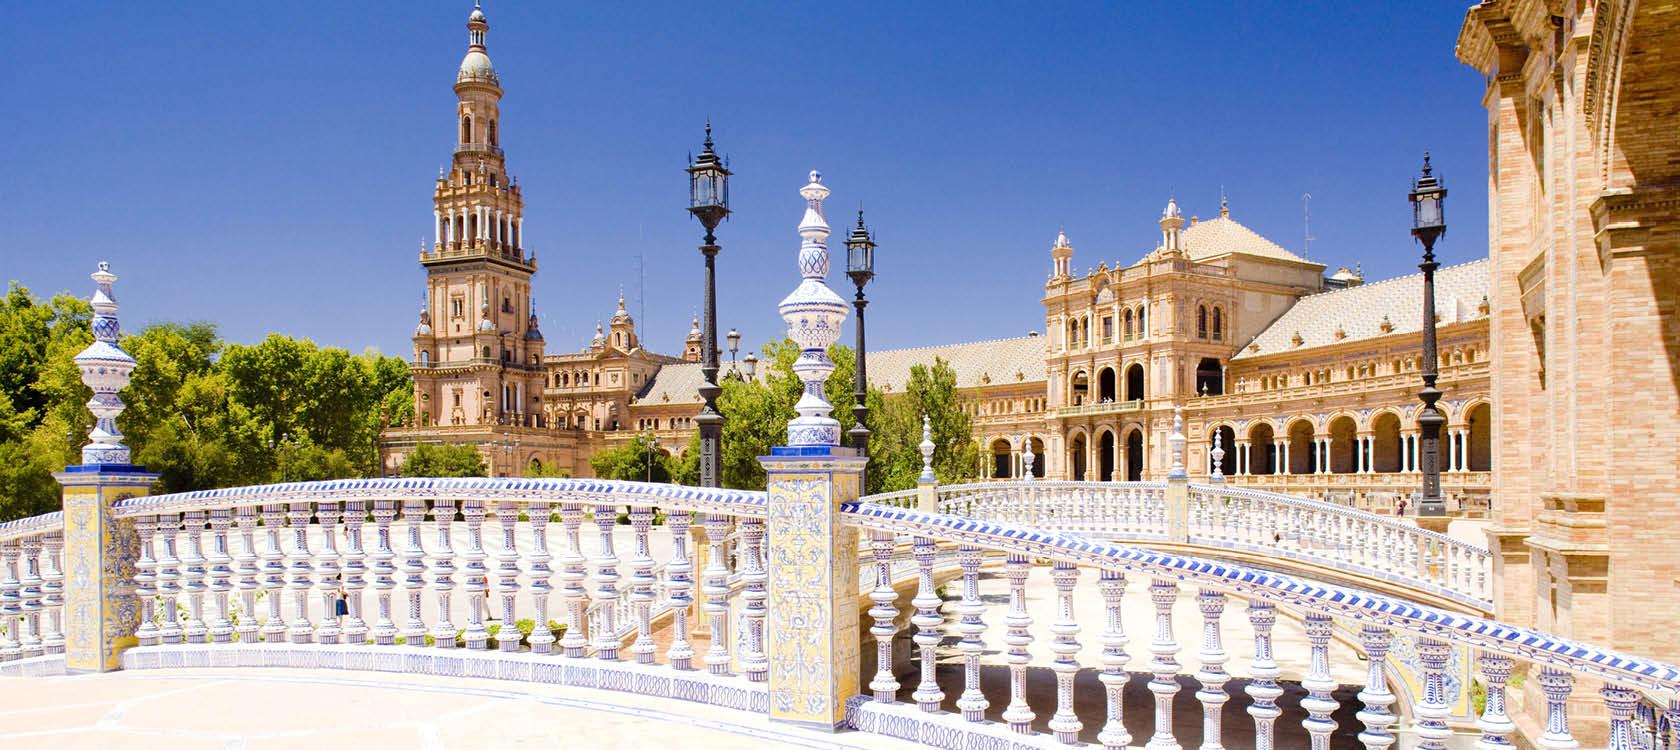 Fantastiska Plaza de Espana i Sevilla.